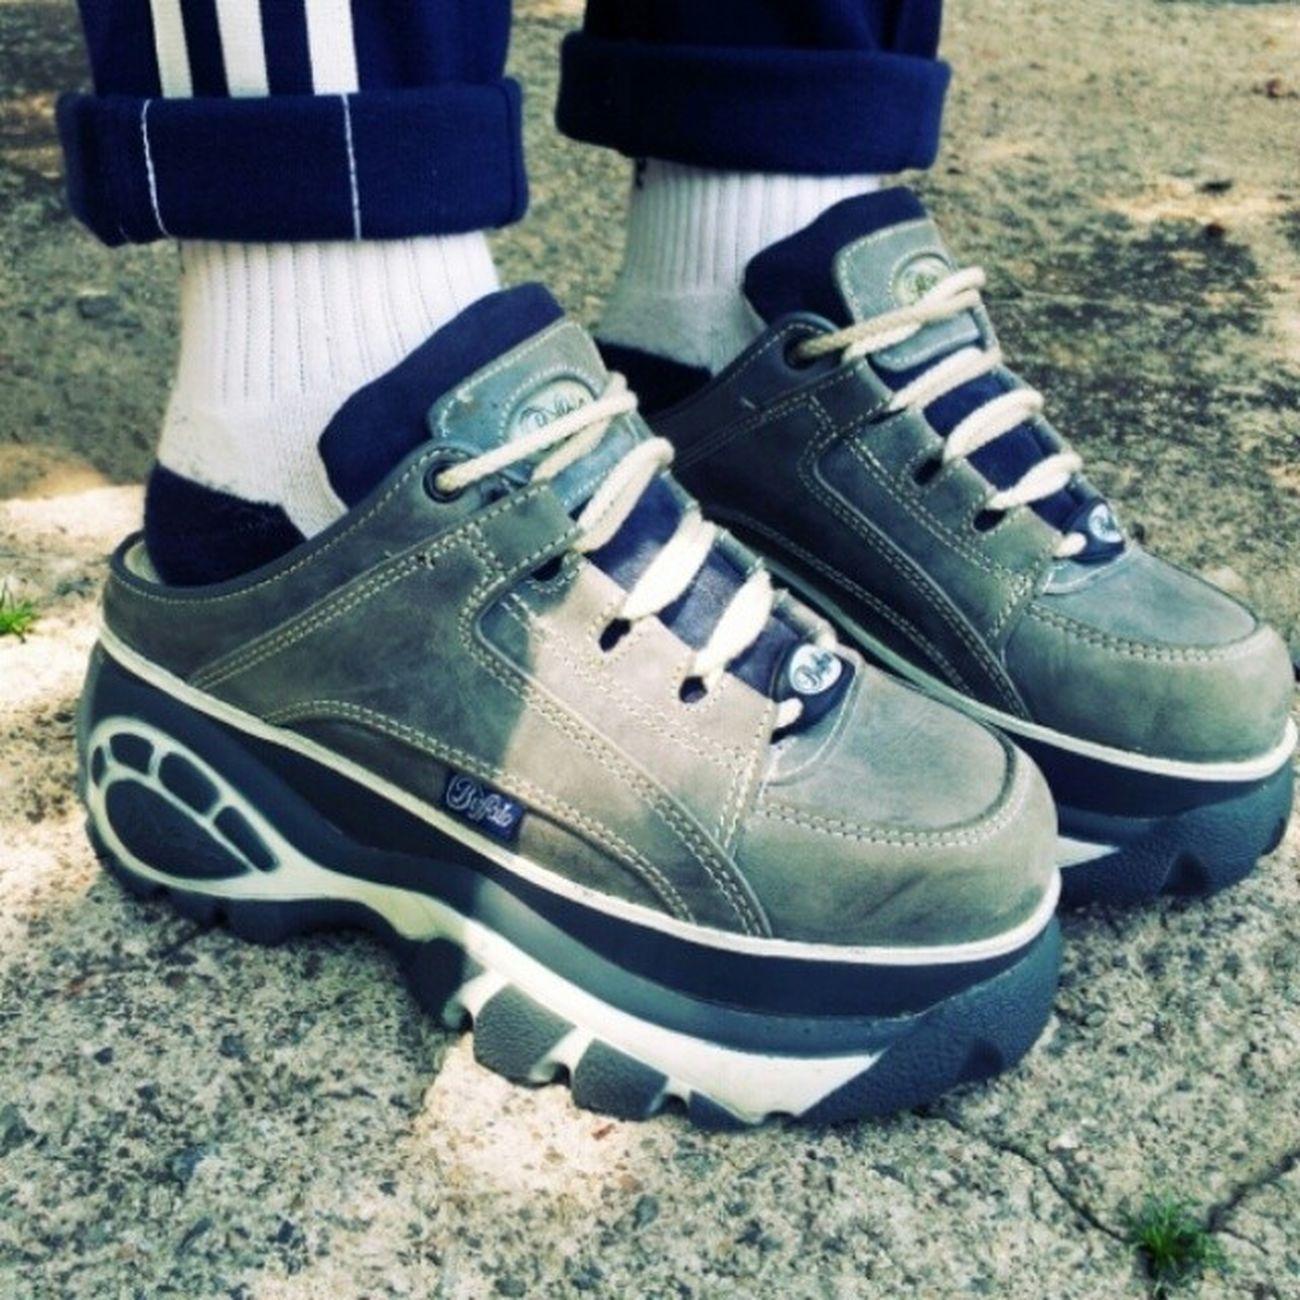 platform Adidas Adidaspants Adidaseuropa Europa europapants platform platformshoes buffaloplatformshoes buffalo buffaloshoes buffaloplatform 아디다스 아디다스유로파 유로파바지 플랫폼 통굽슈즈